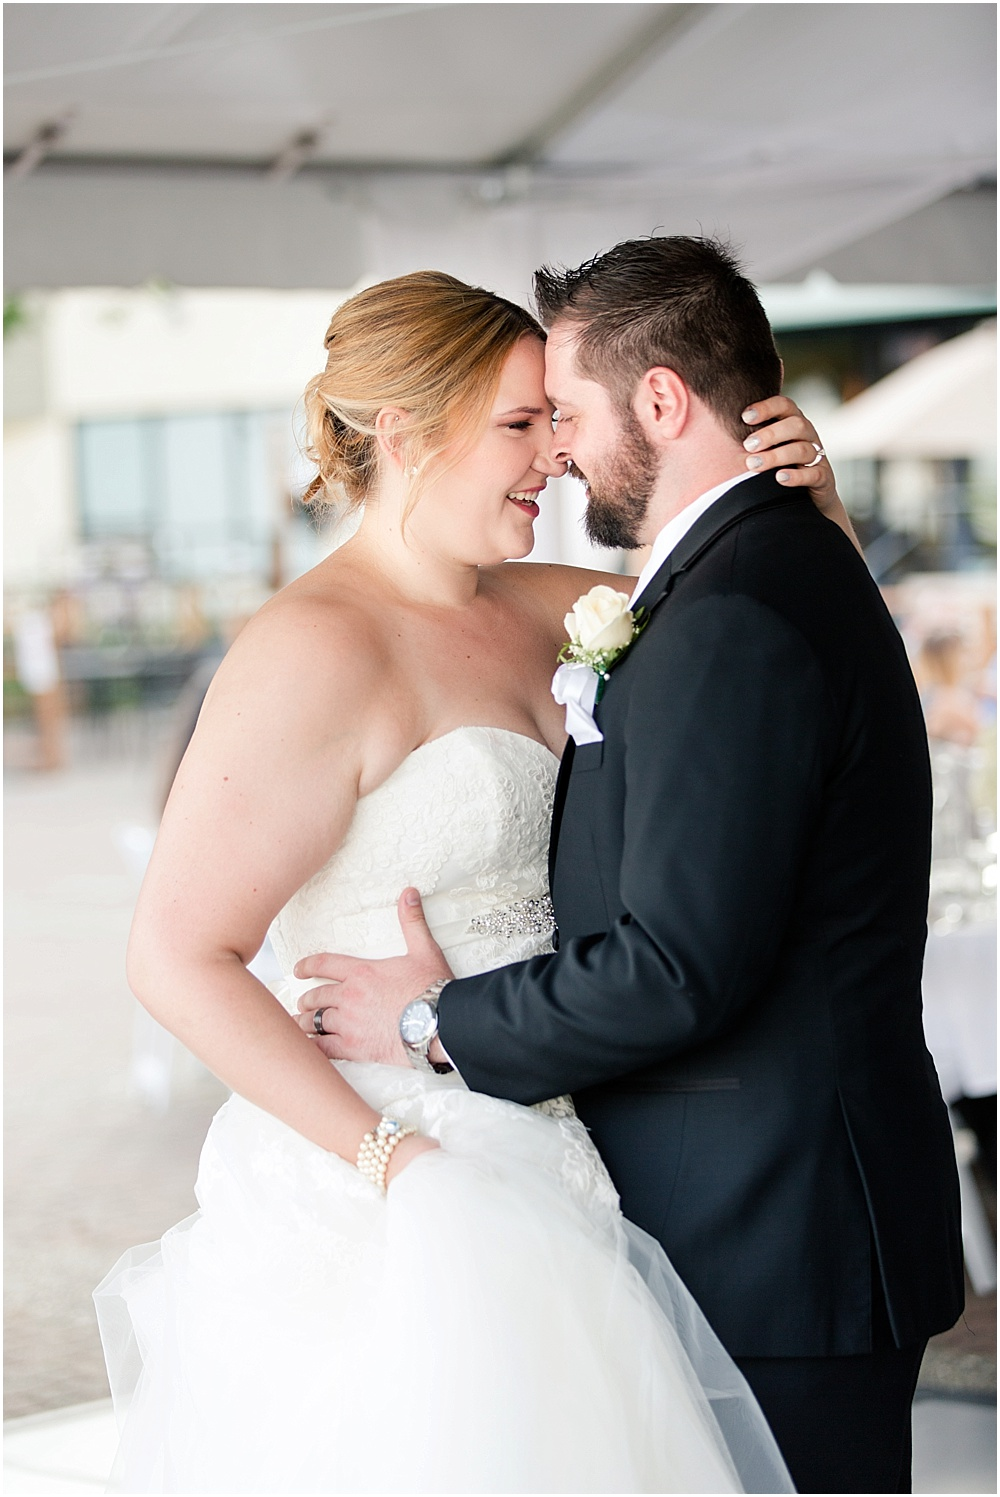 mitzner_silverdale_beach_hotel_wedding_silverdale_washington_pacific_northwest_wedding_photographer_0106